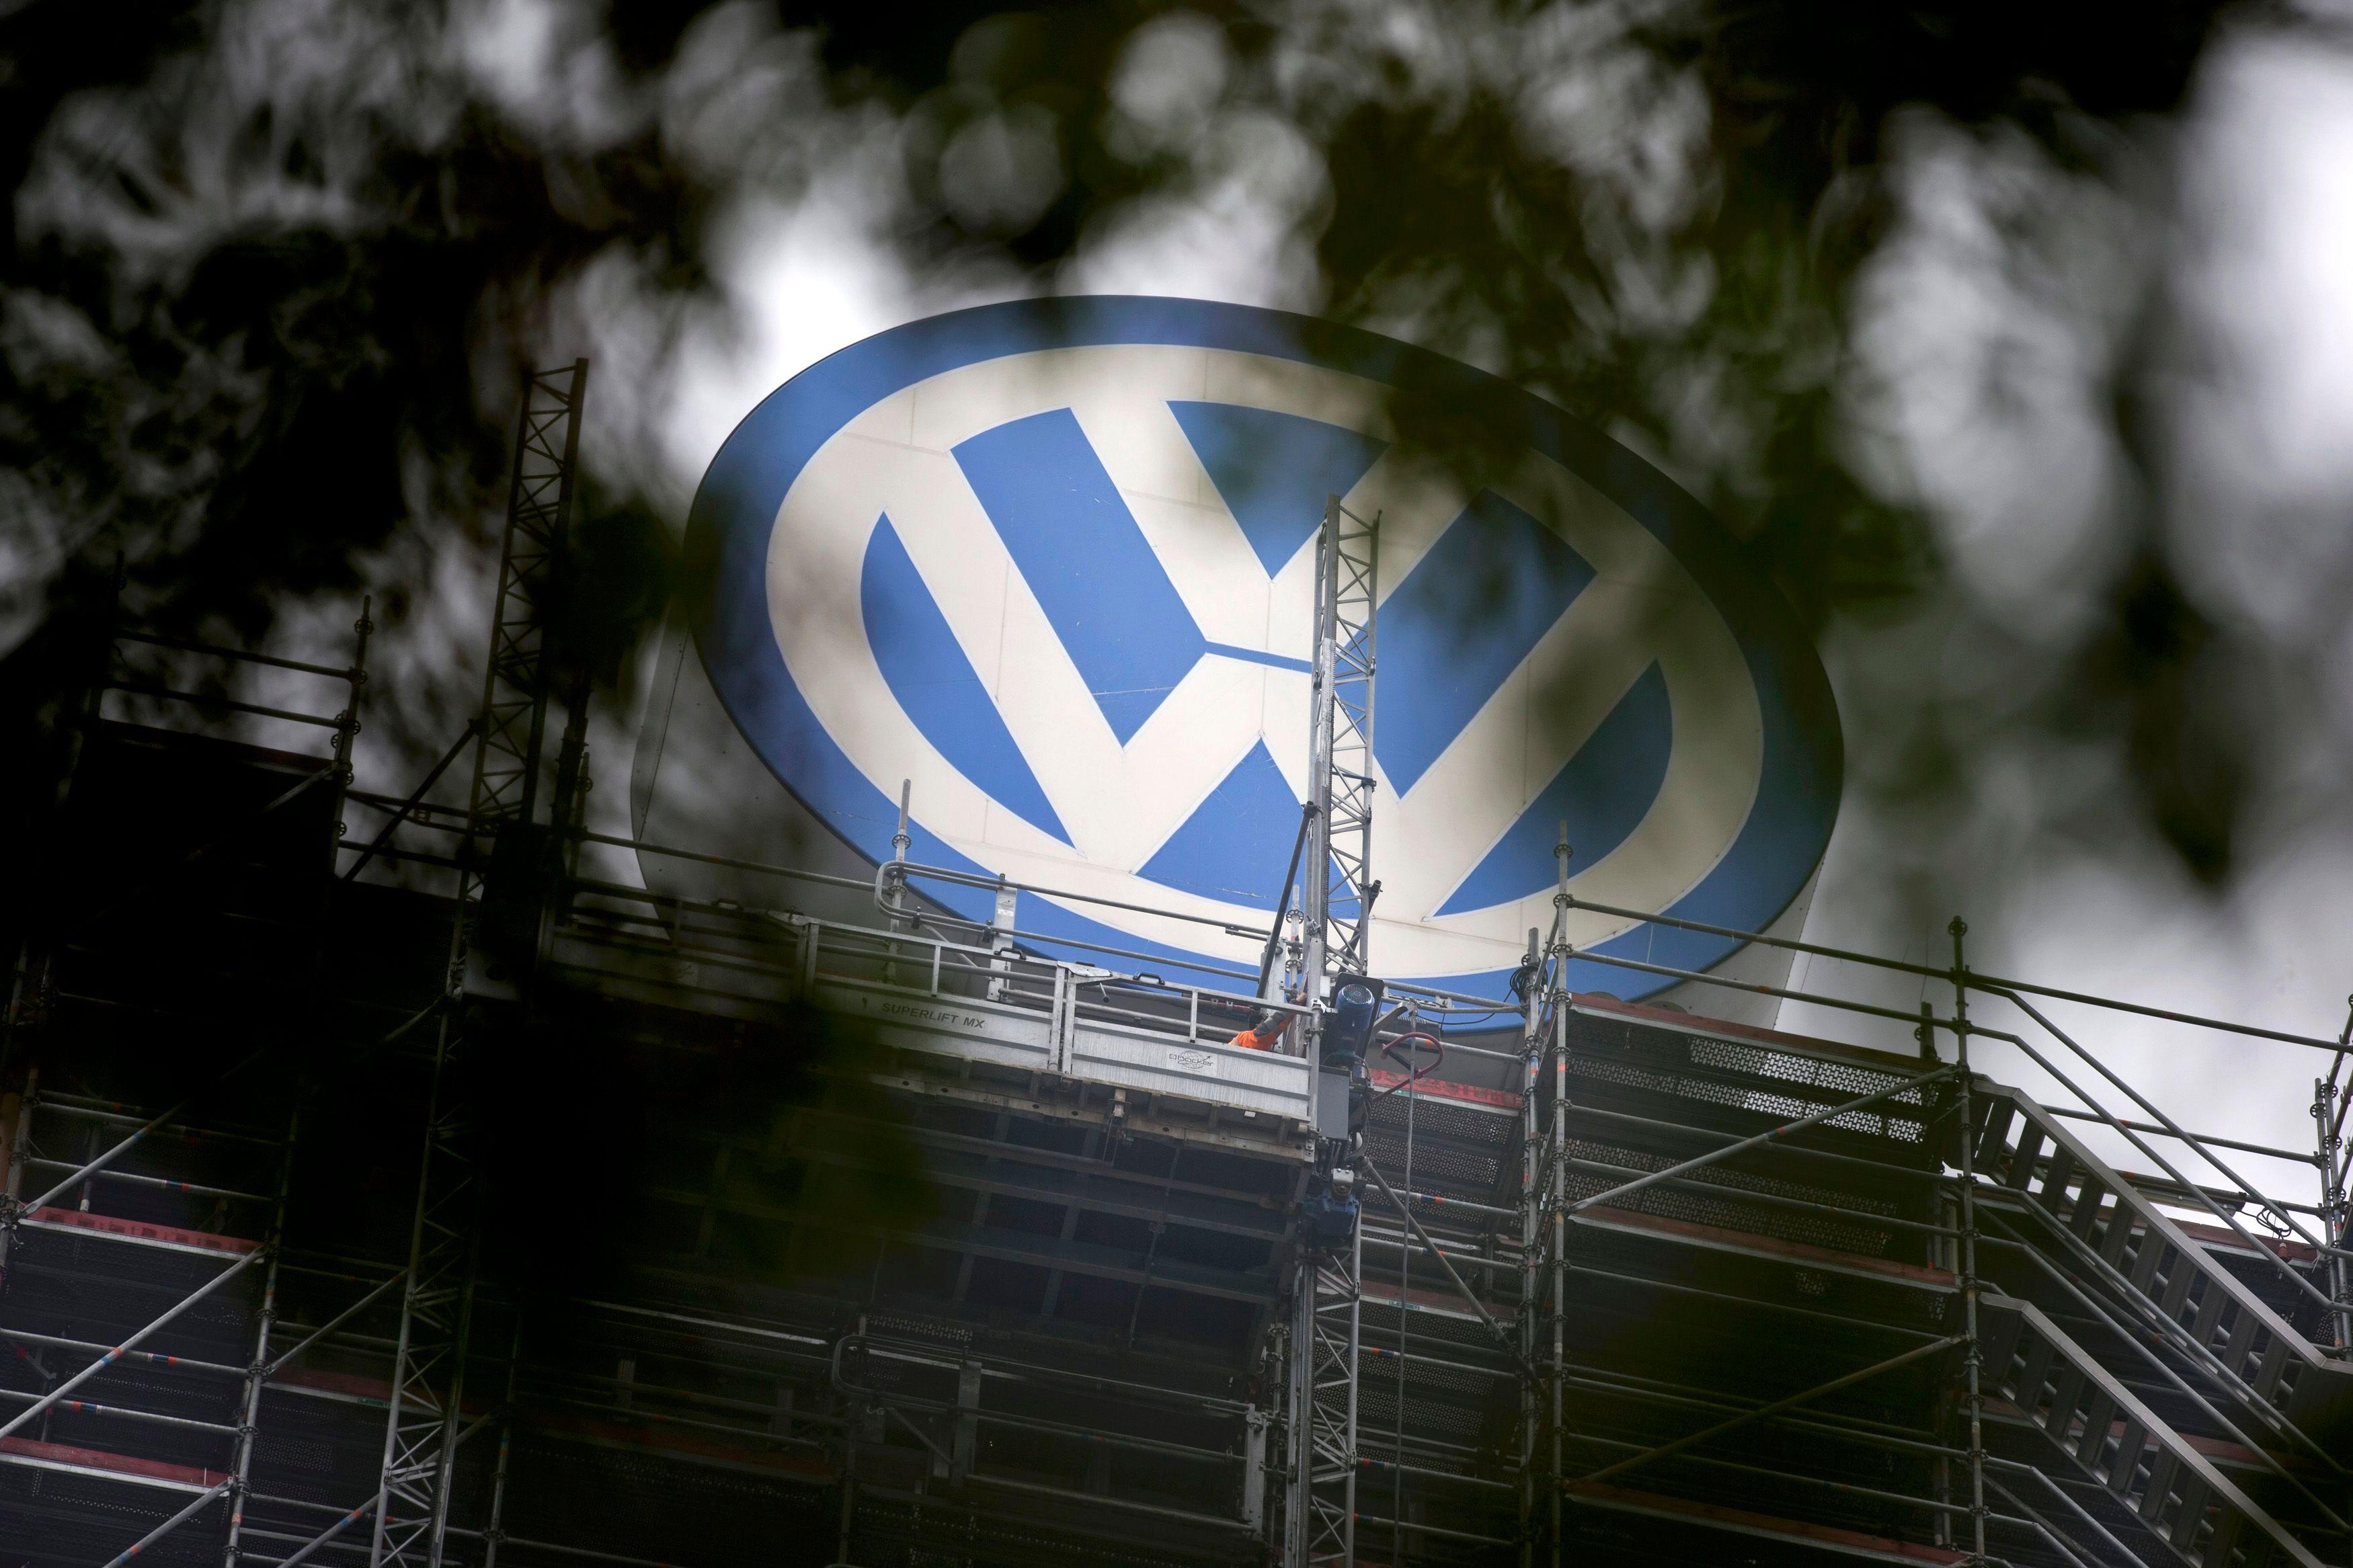 Volkswagen лишился уже 30 млрд евро из-за «дизельгейта»- Kapital.kz